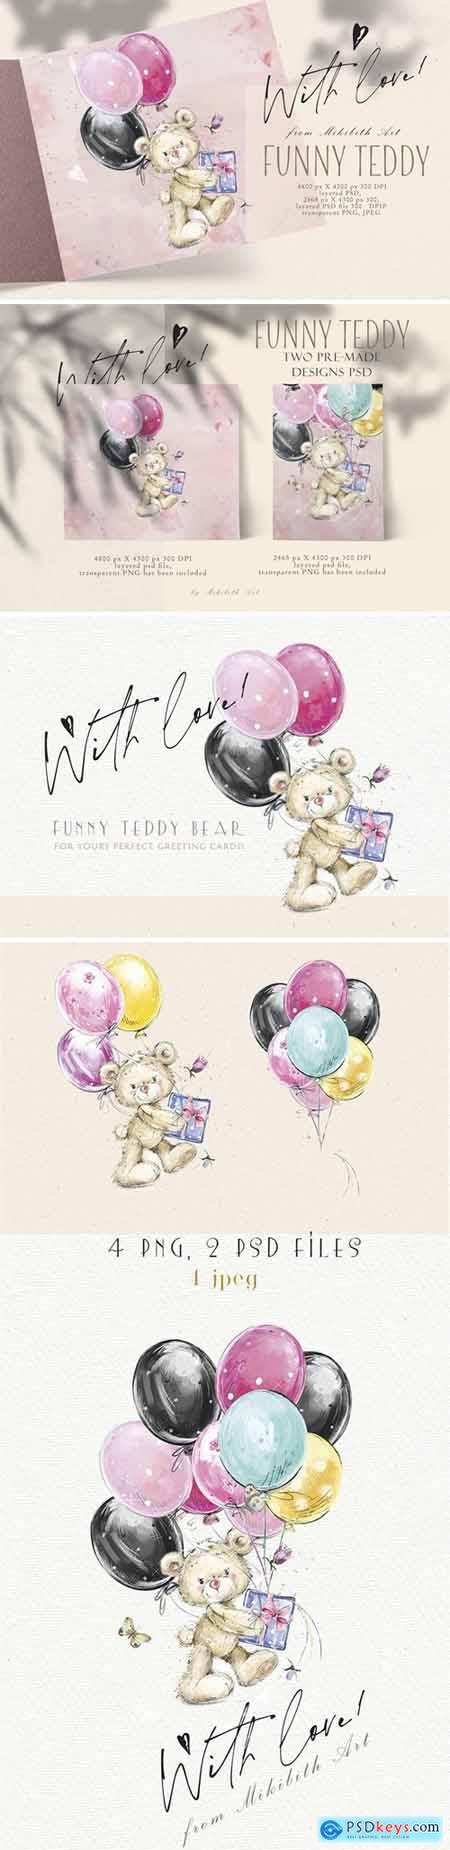 Teddy bear illustration & ready-made design